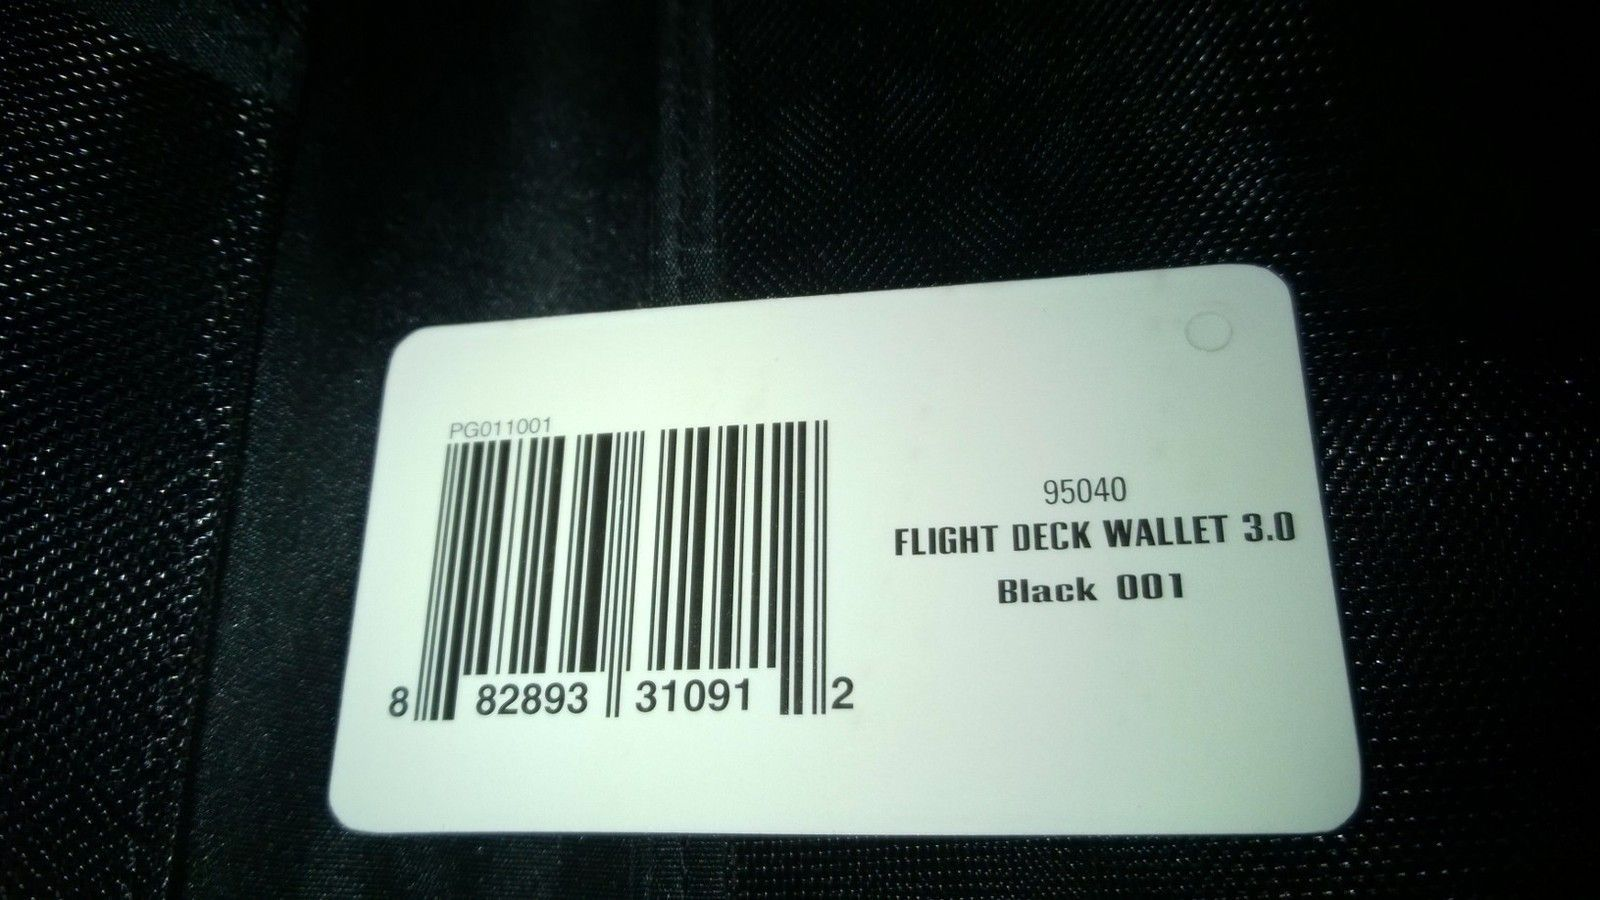 Flight Deck 3.0 Travel Wallet 95040-001 Black Camo - WP_20150128_001.jpg